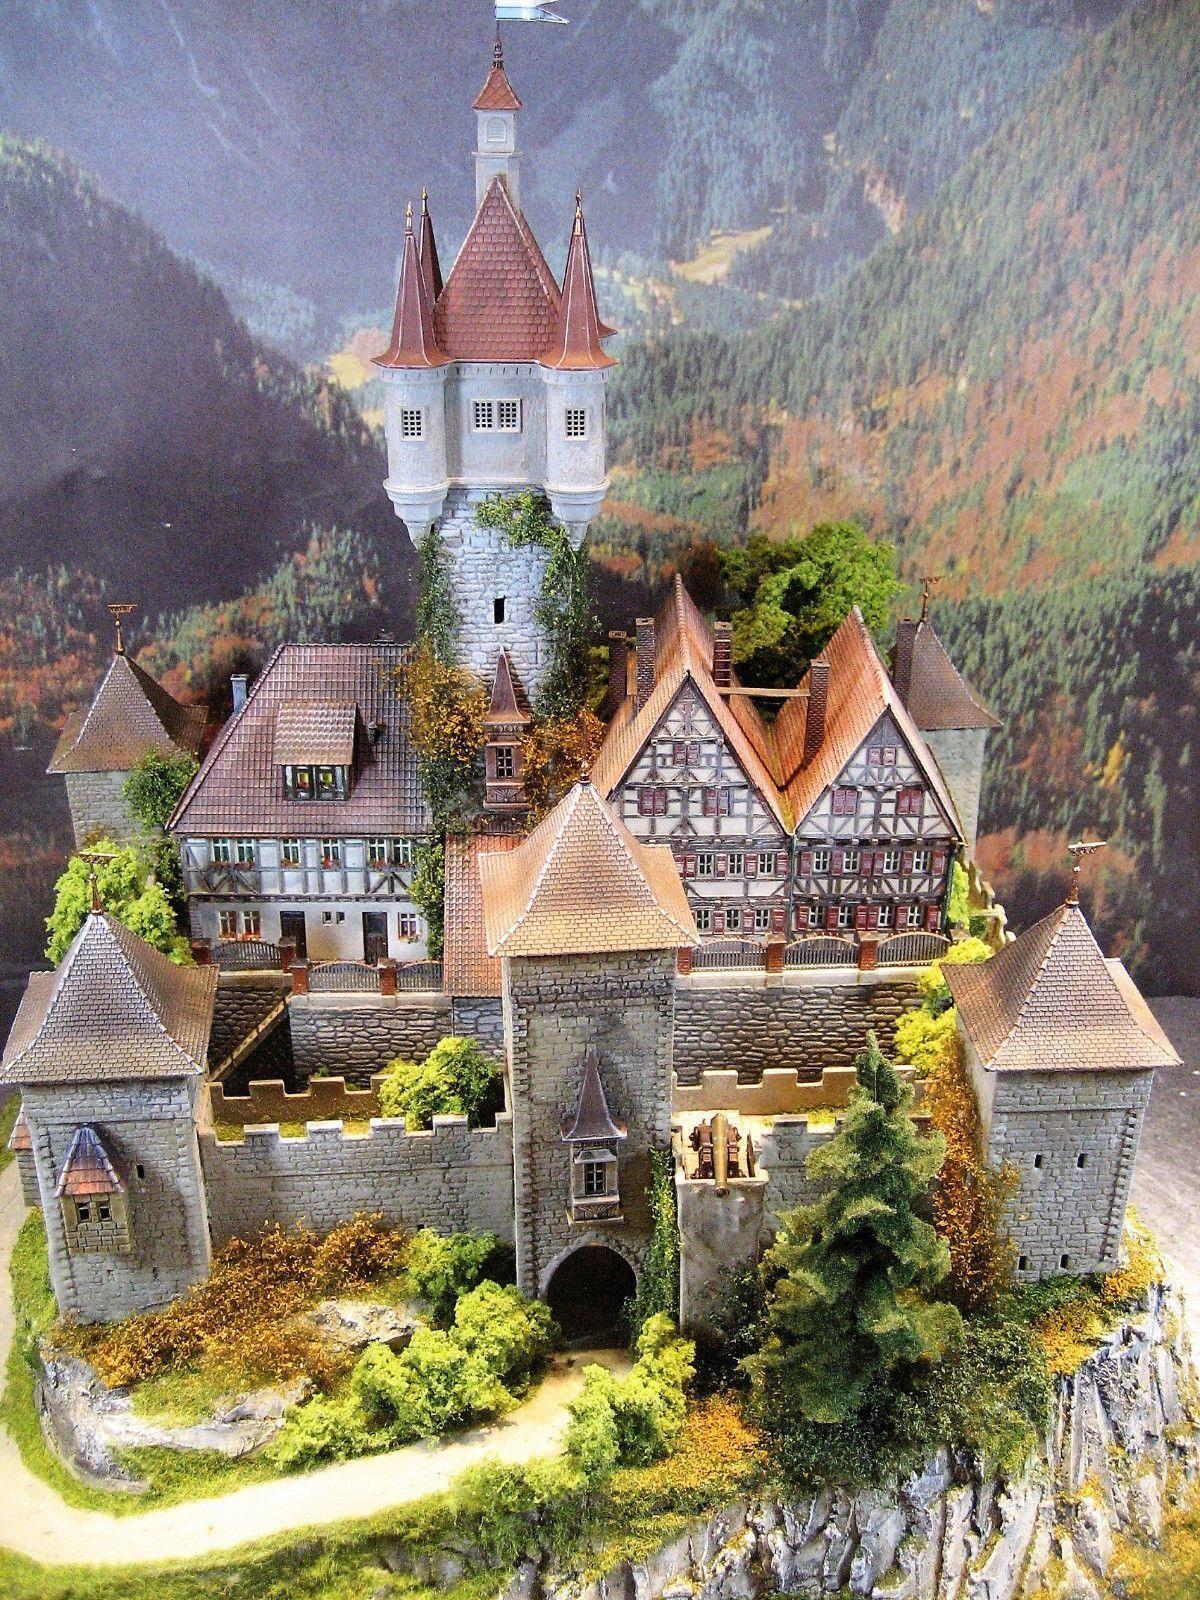 Diorama Schloss Burg Ravensburg Exclusivmodell In Modellbau Modelleisenbahn Spur H0 Ebay Mode Model Trains Model Castle Model Train Layouts